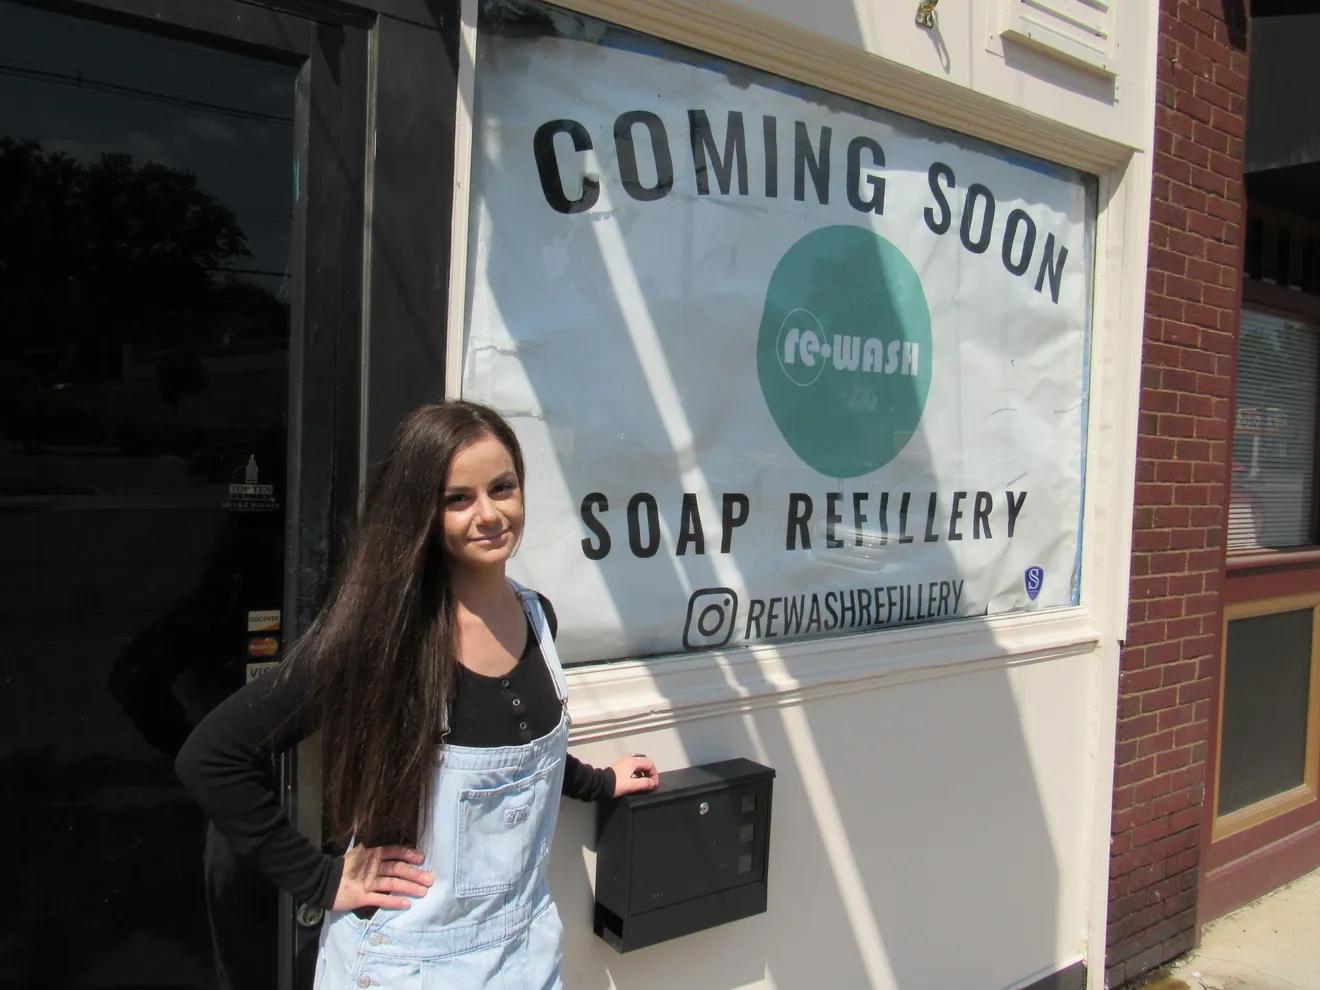 'Socially responsible' soap dispensary ReWash to open in Clintonville